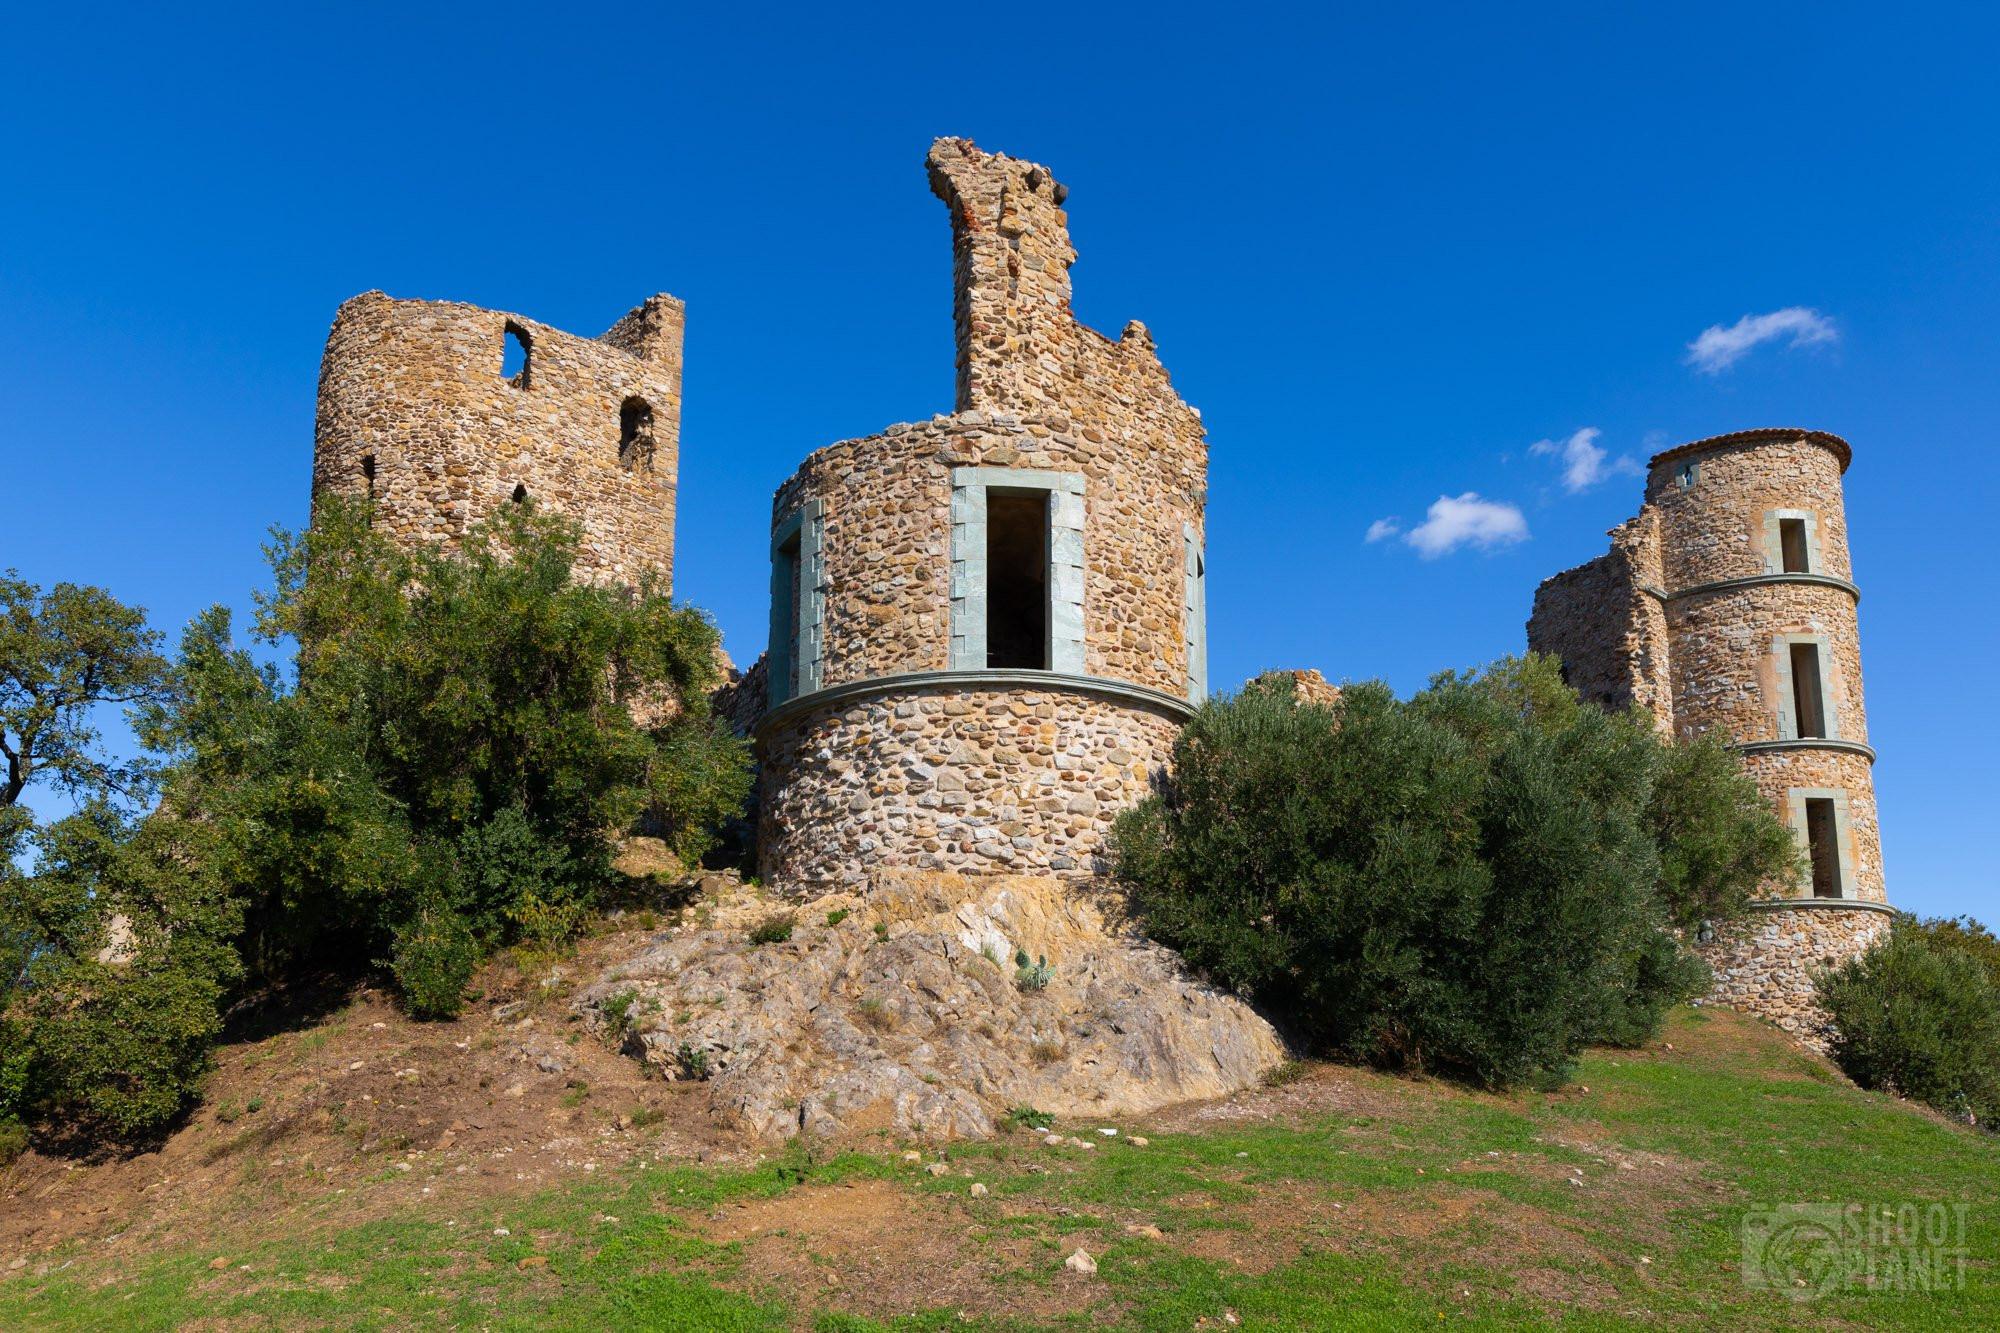 Grimaud village, near Saint Tropez, France